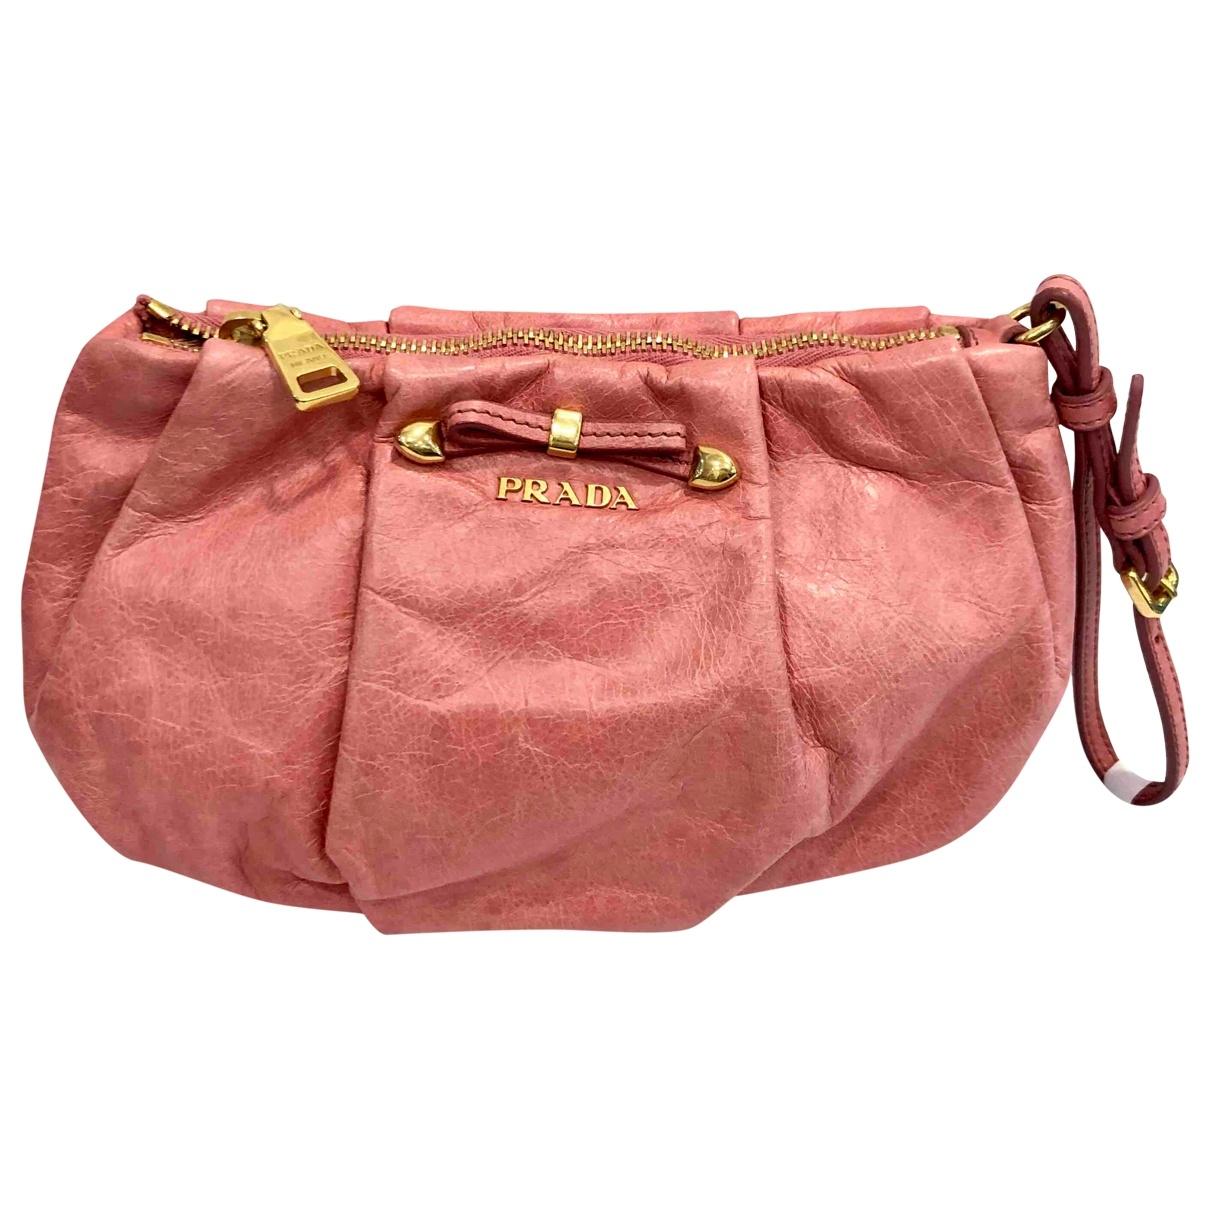 Prada \N Pink Leather Clutch bag for Women \N